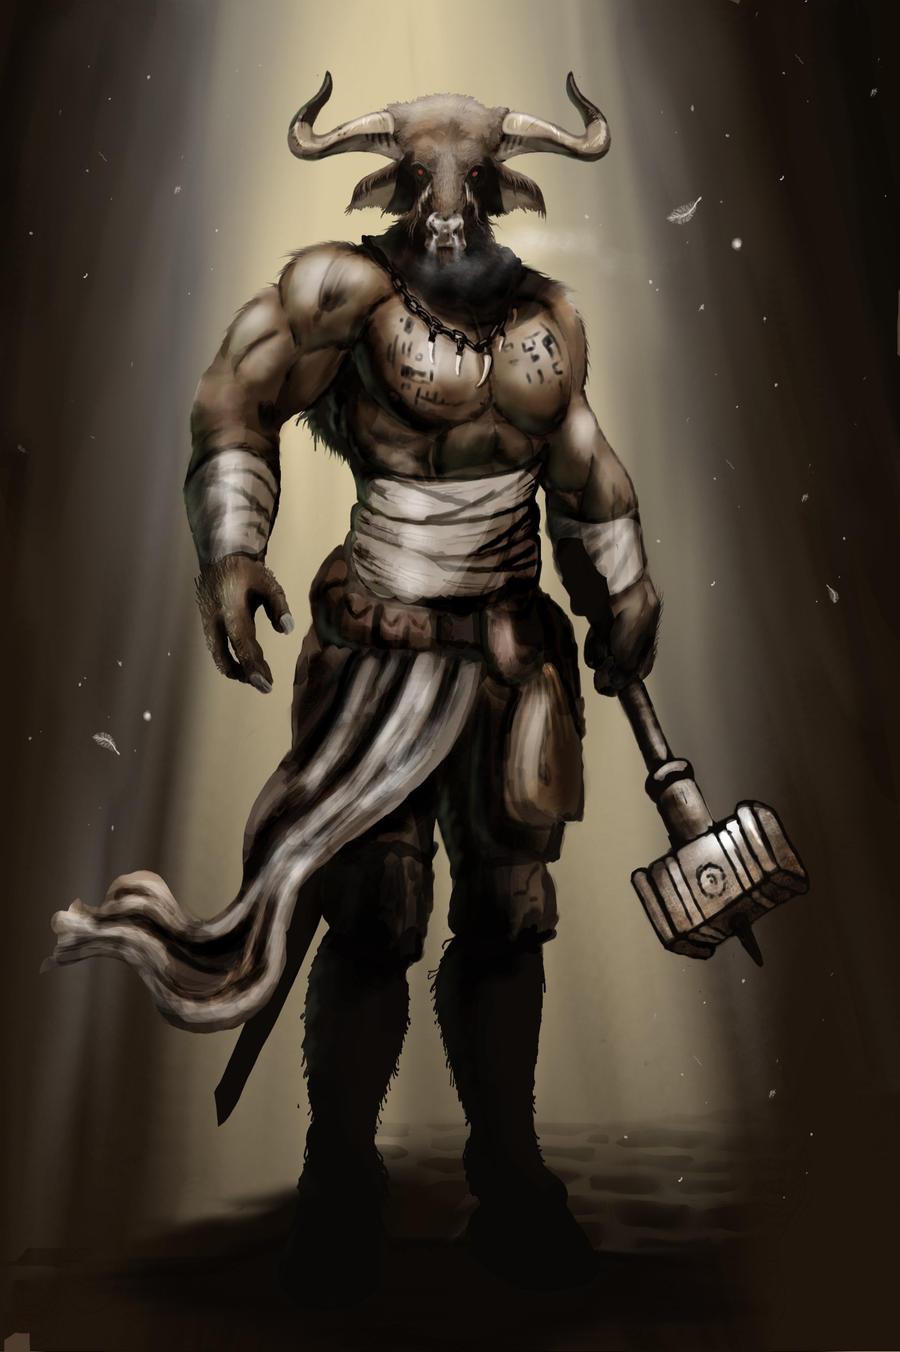 Stravične i jezive legende Minotaur_warrior_by_bradlyvancamp-d4l8l8o